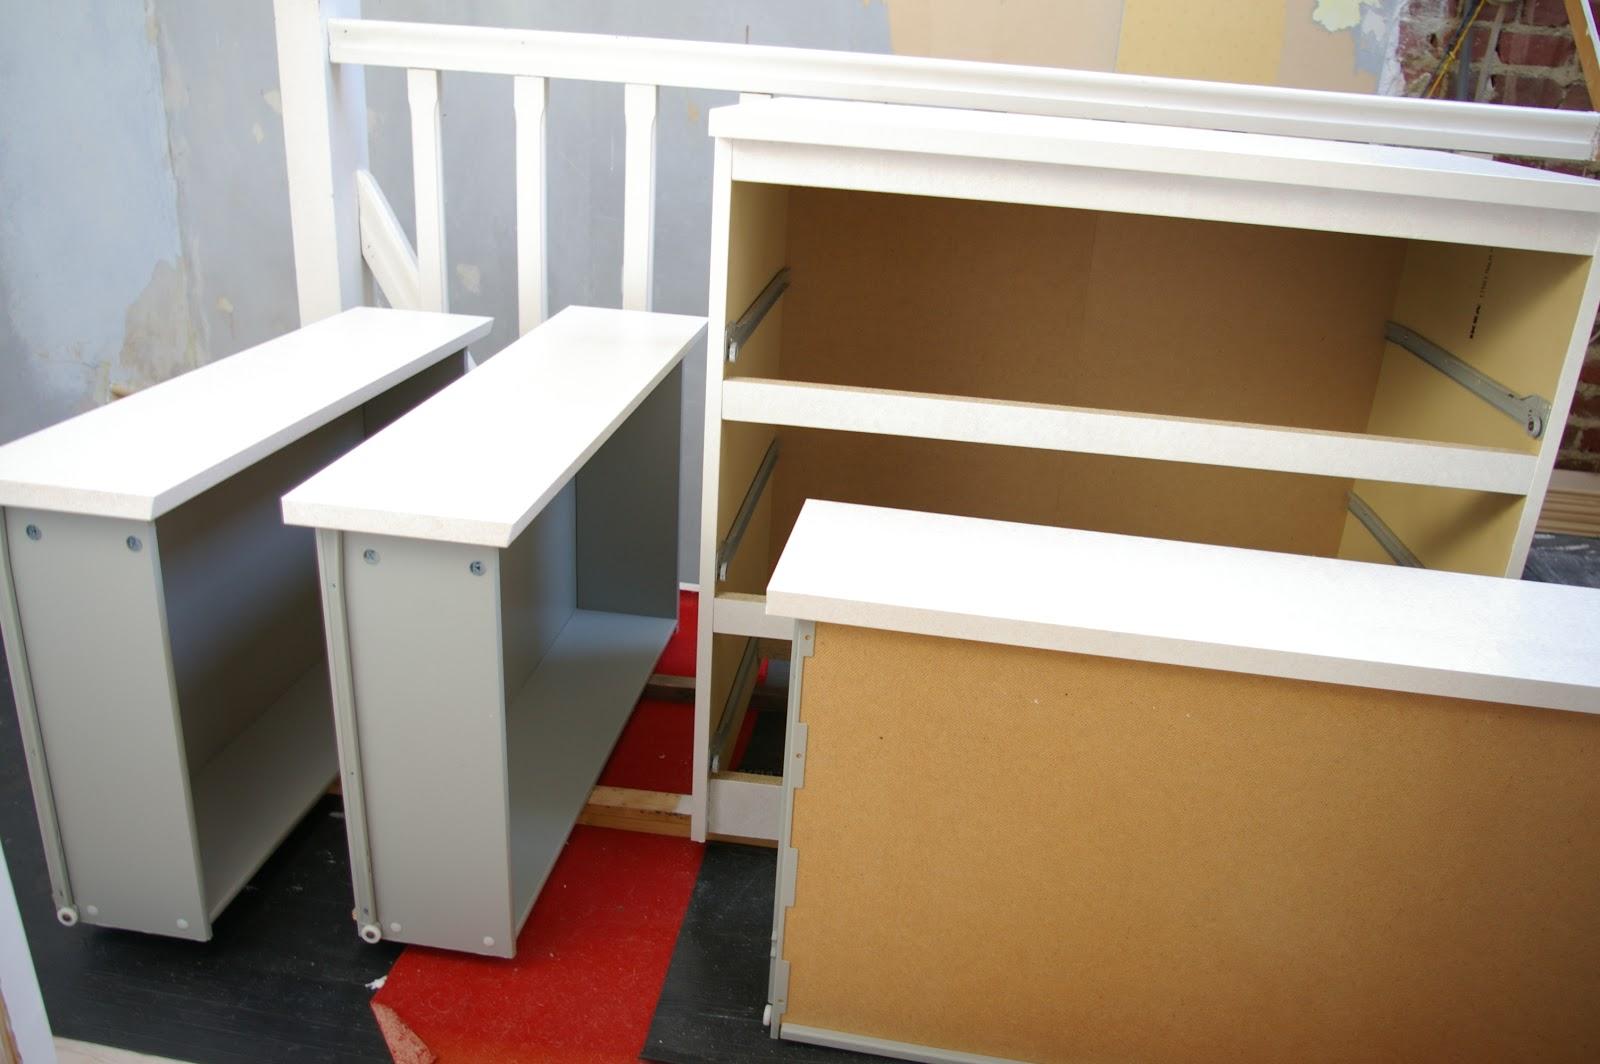 Diy peindre des meubles en m lamin s for Peindre du stratifie